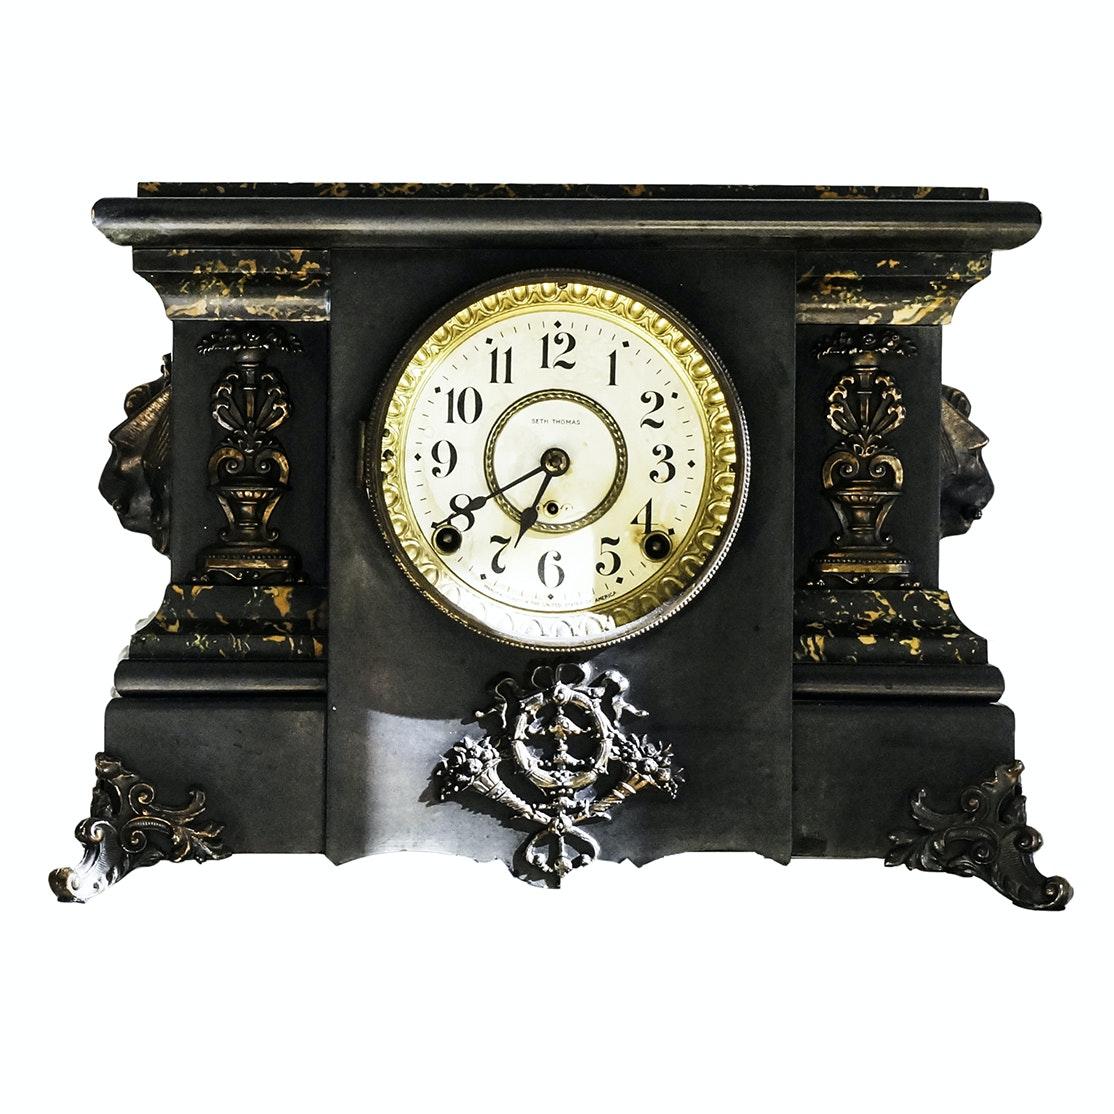 Antique Seth Thomas Pillar Mantel Clock